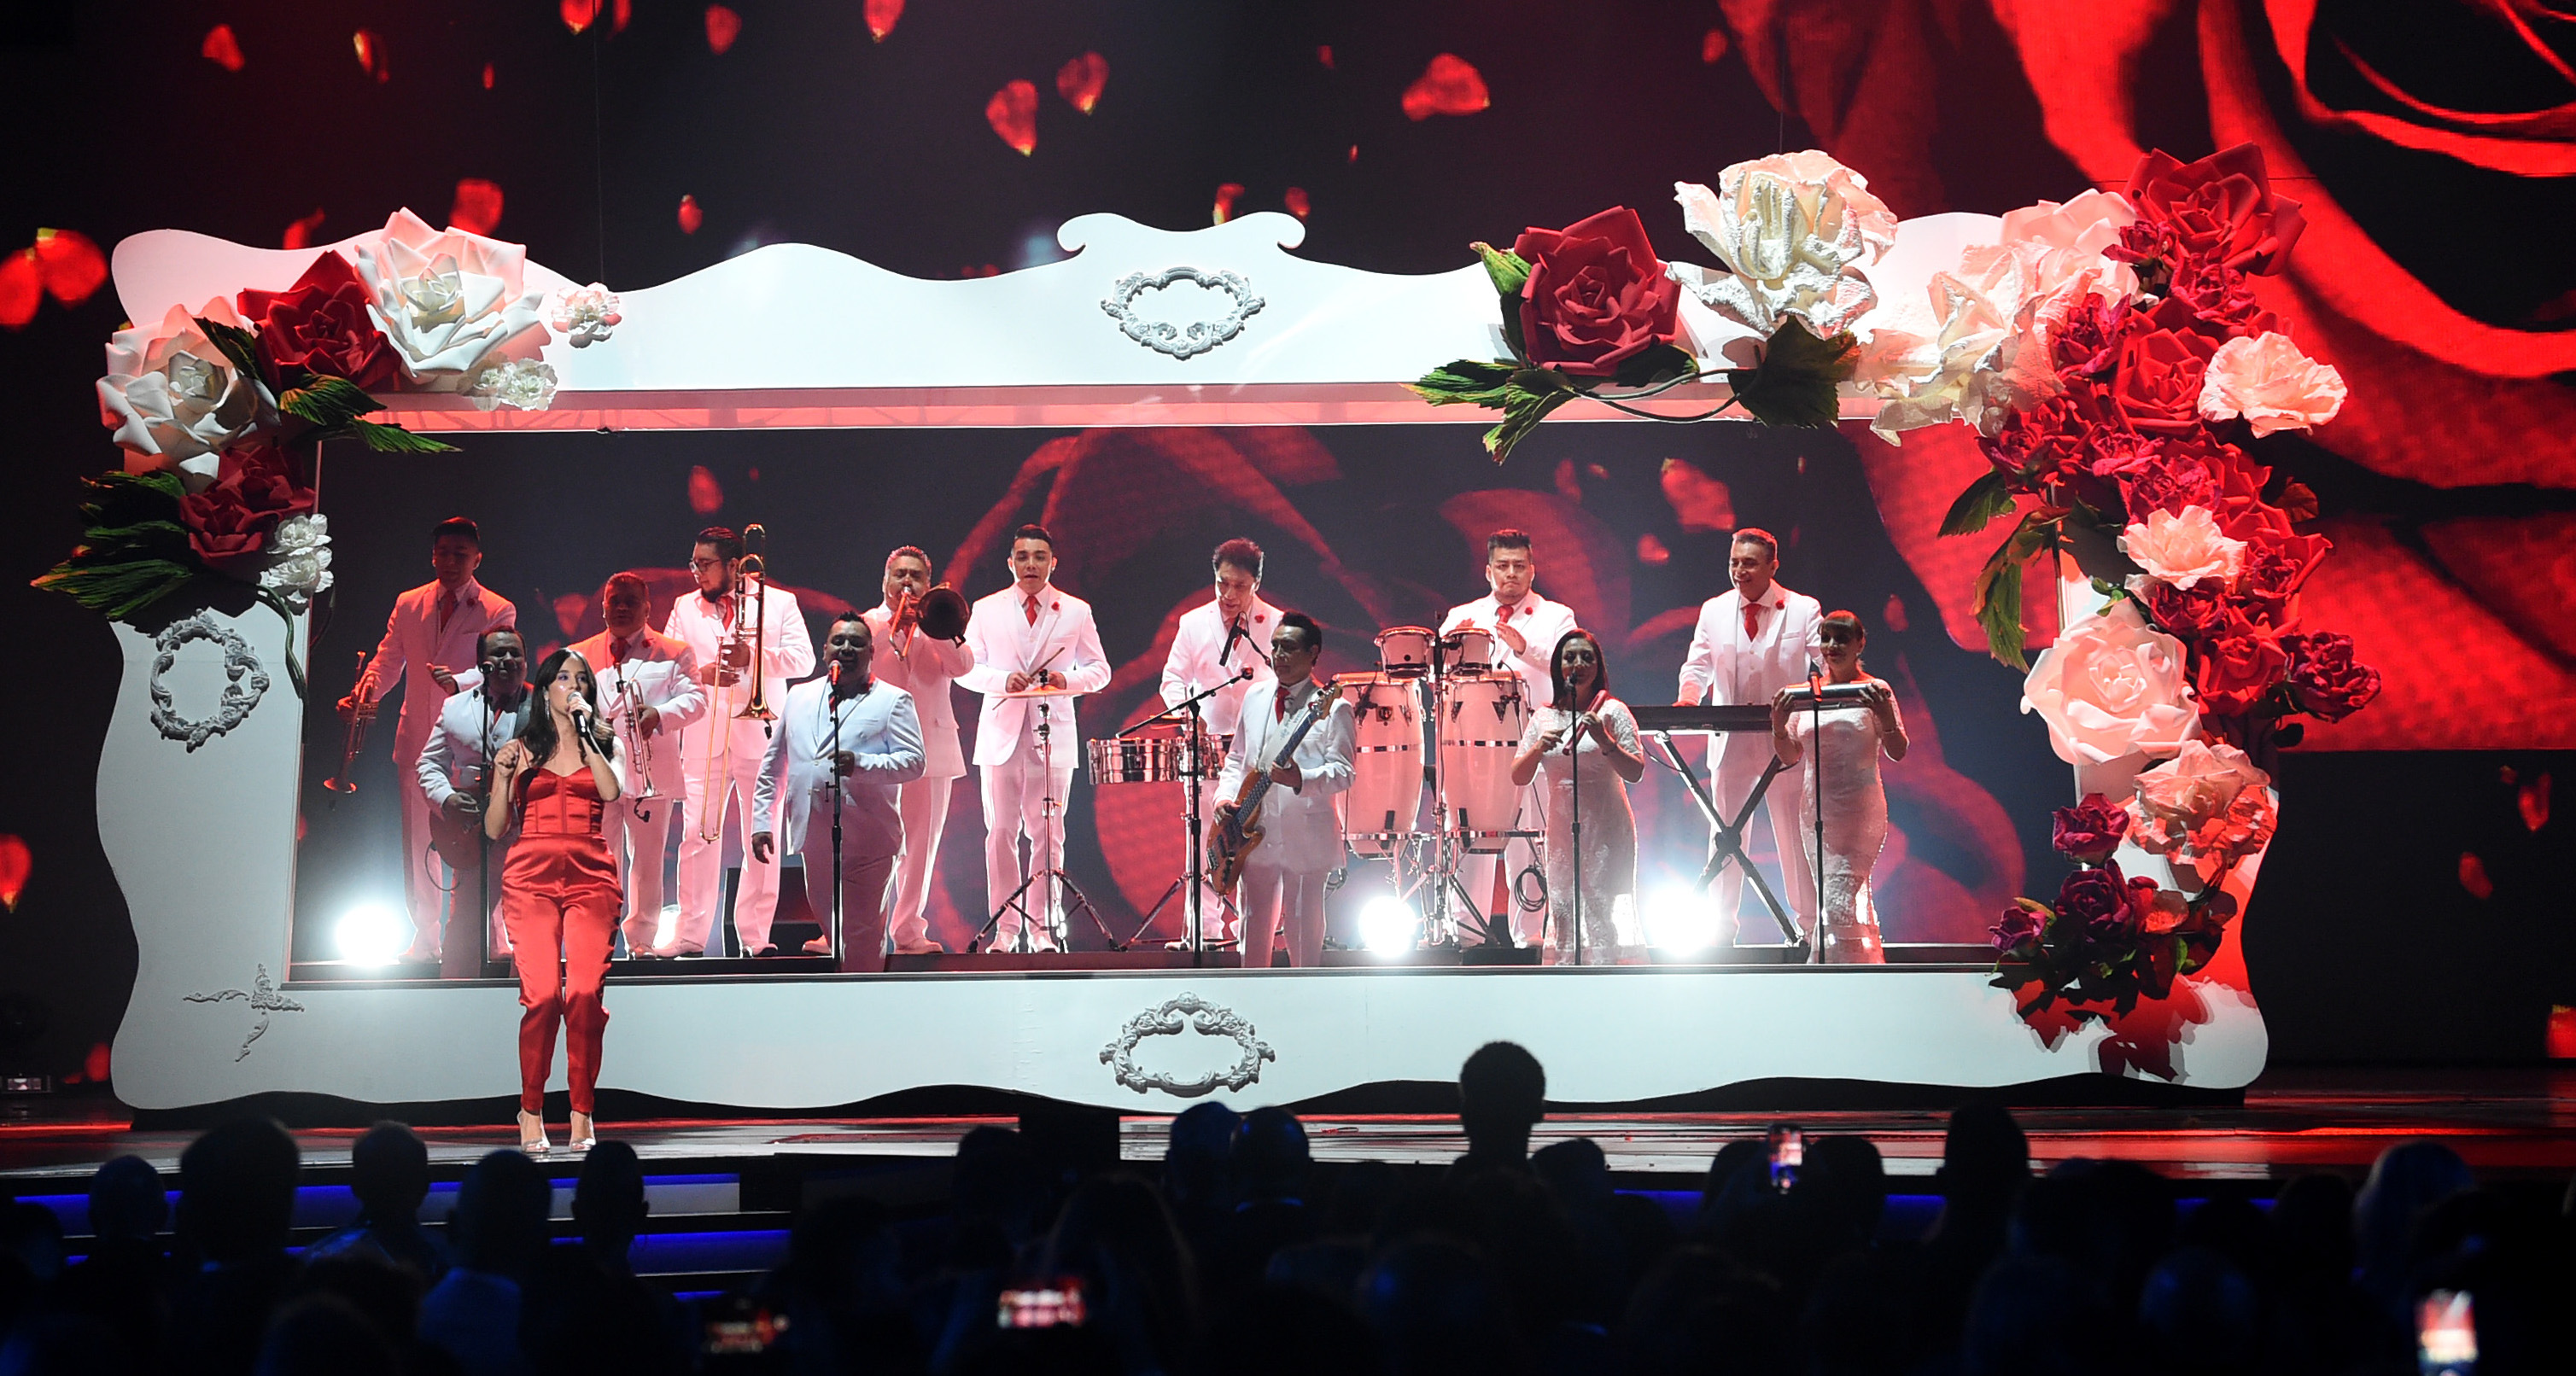 From Natalia Lafourcade to Ximena Sariñana: 5 of Los Ángeles Azules' Best Pop Collaborations